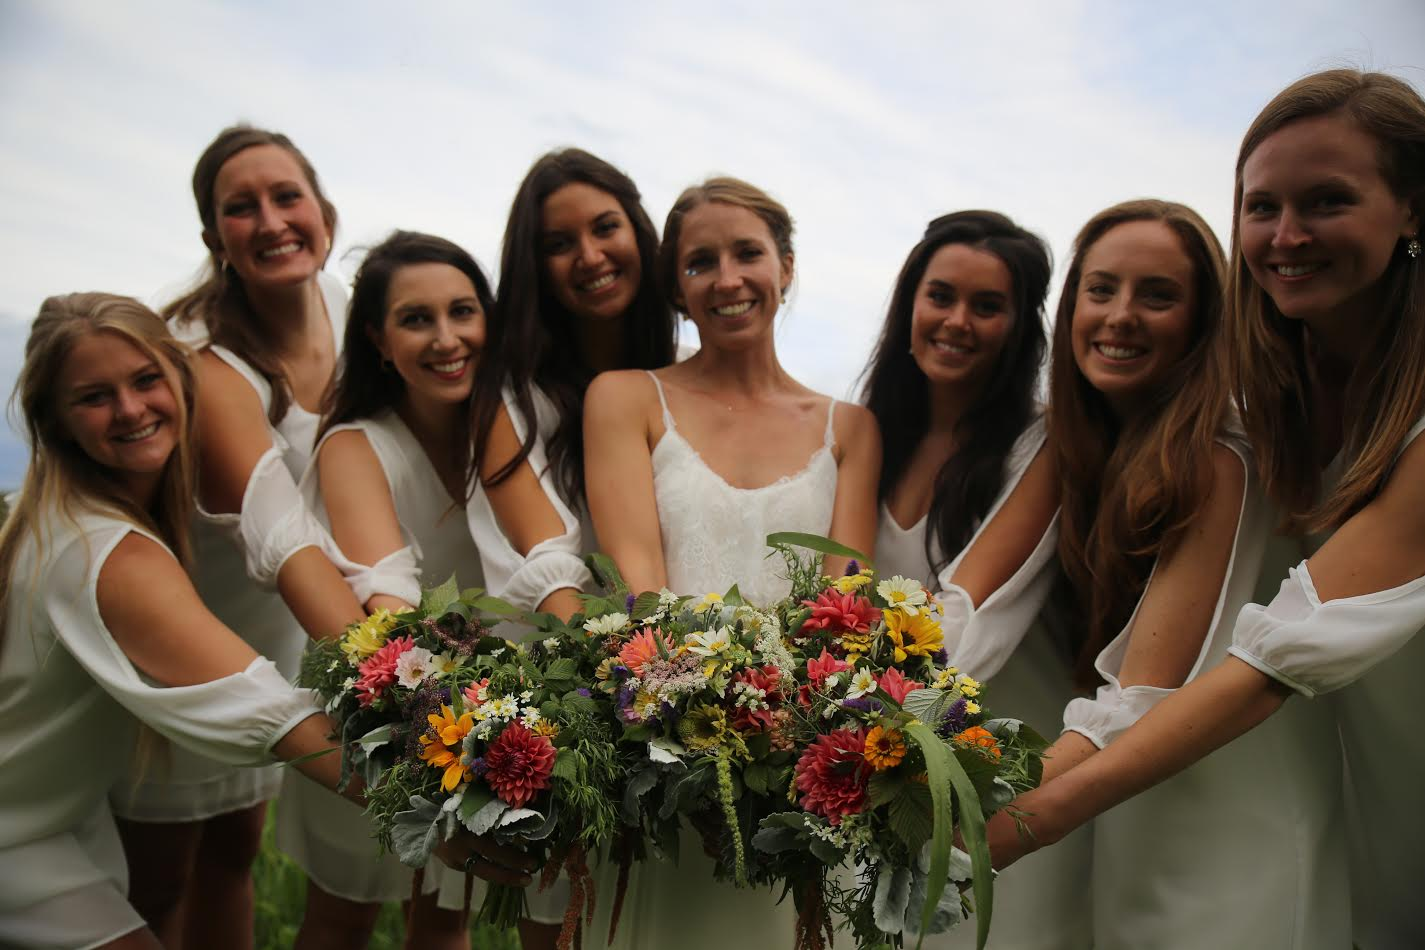 photo credit: friend of bride, Emily